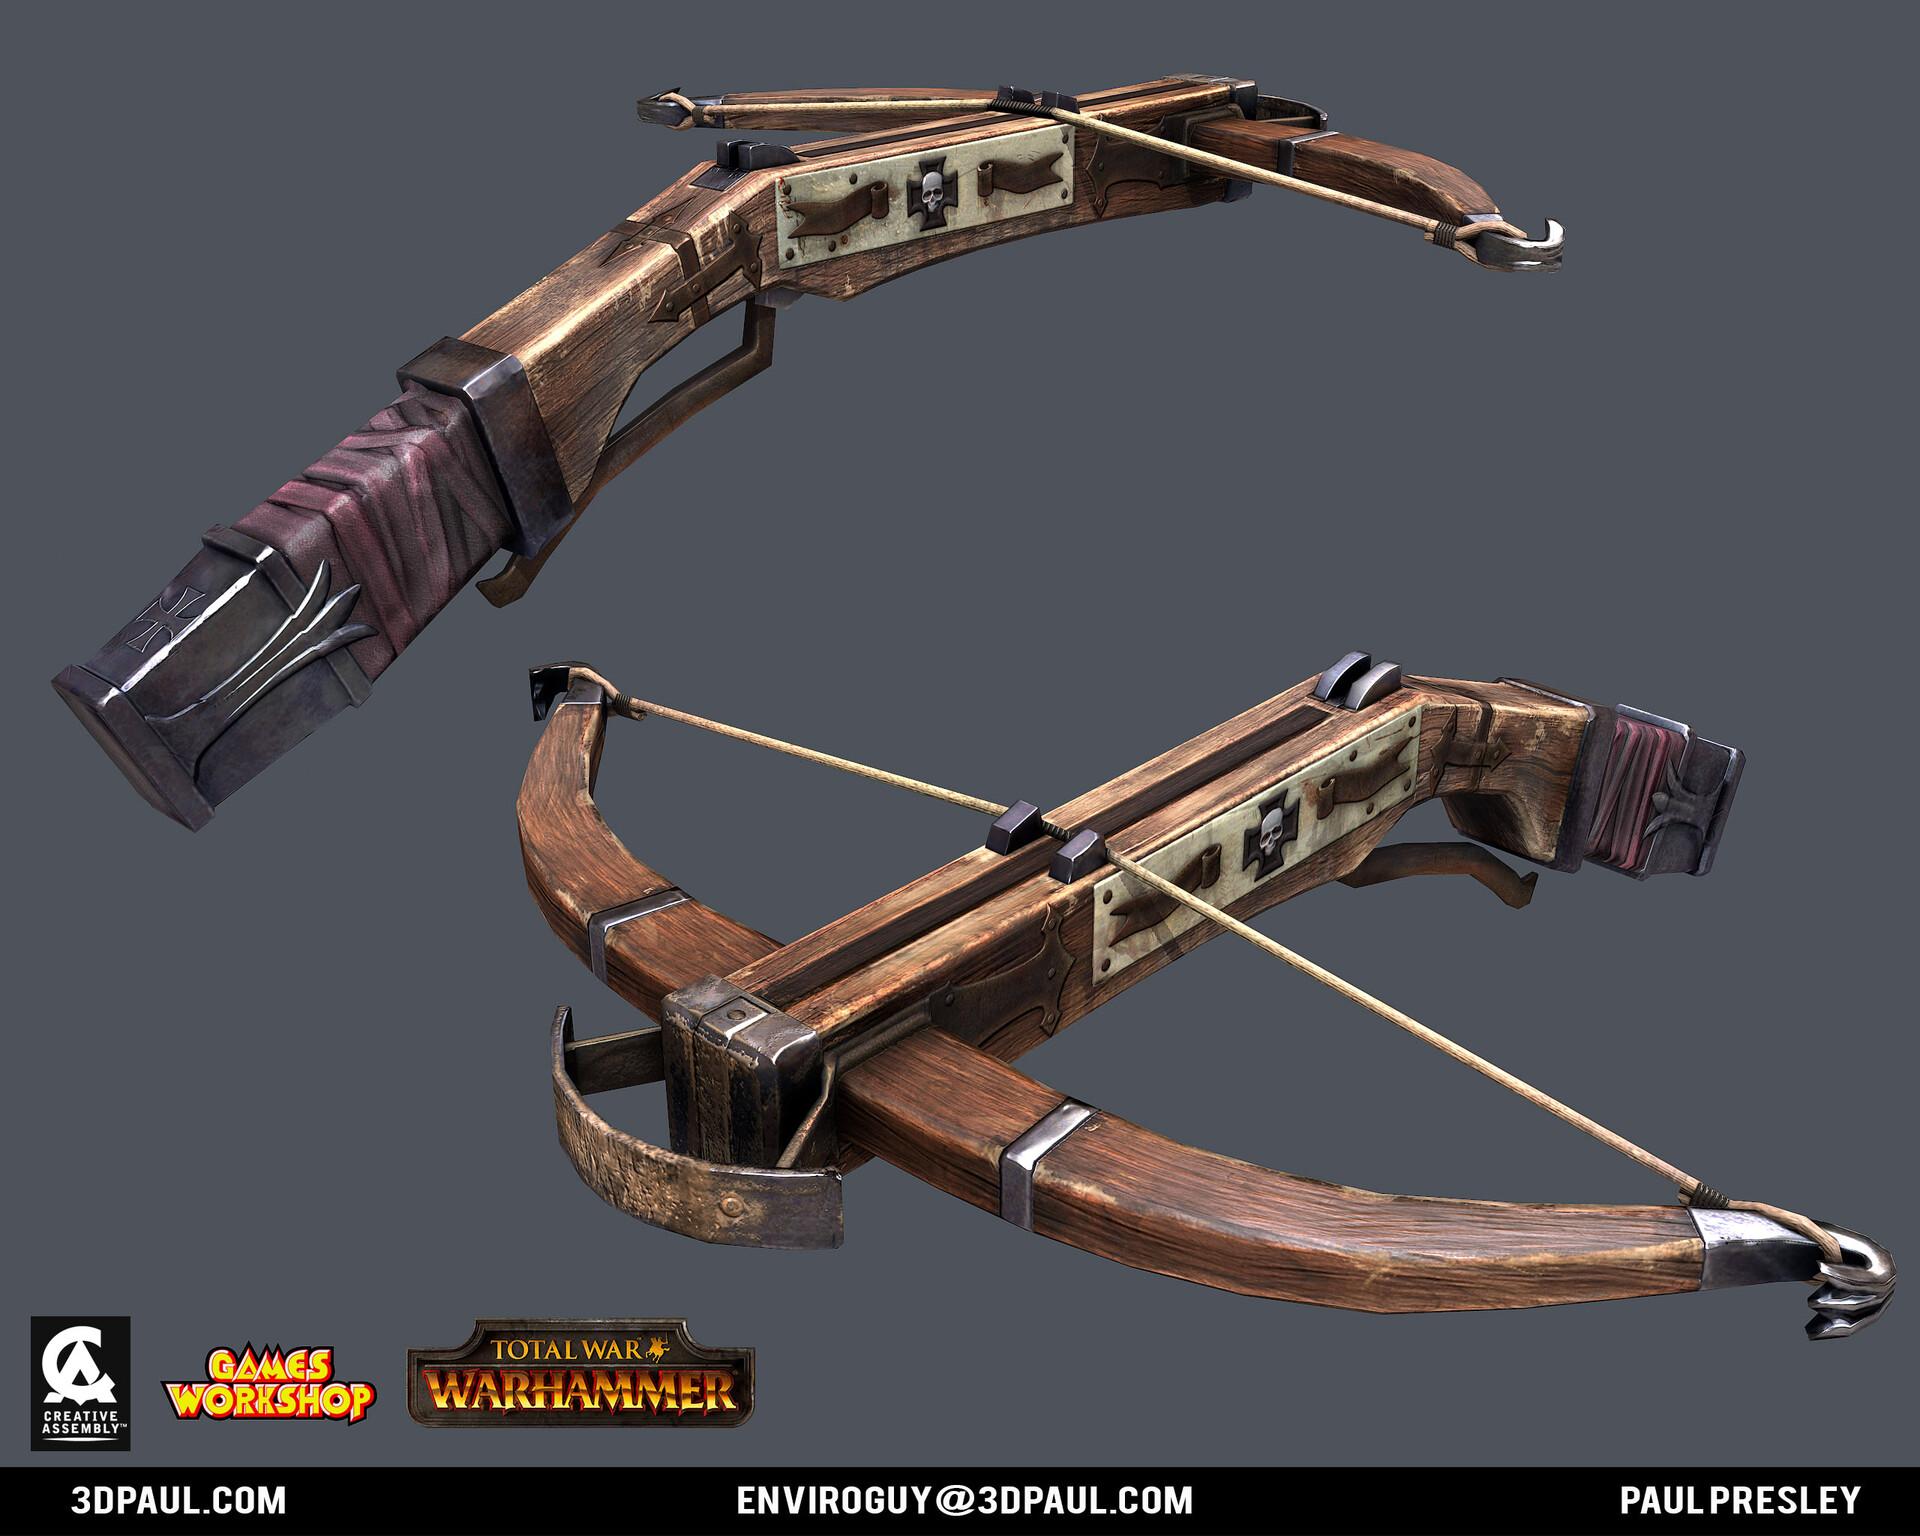 Paul presley ca empire 08 crossbow